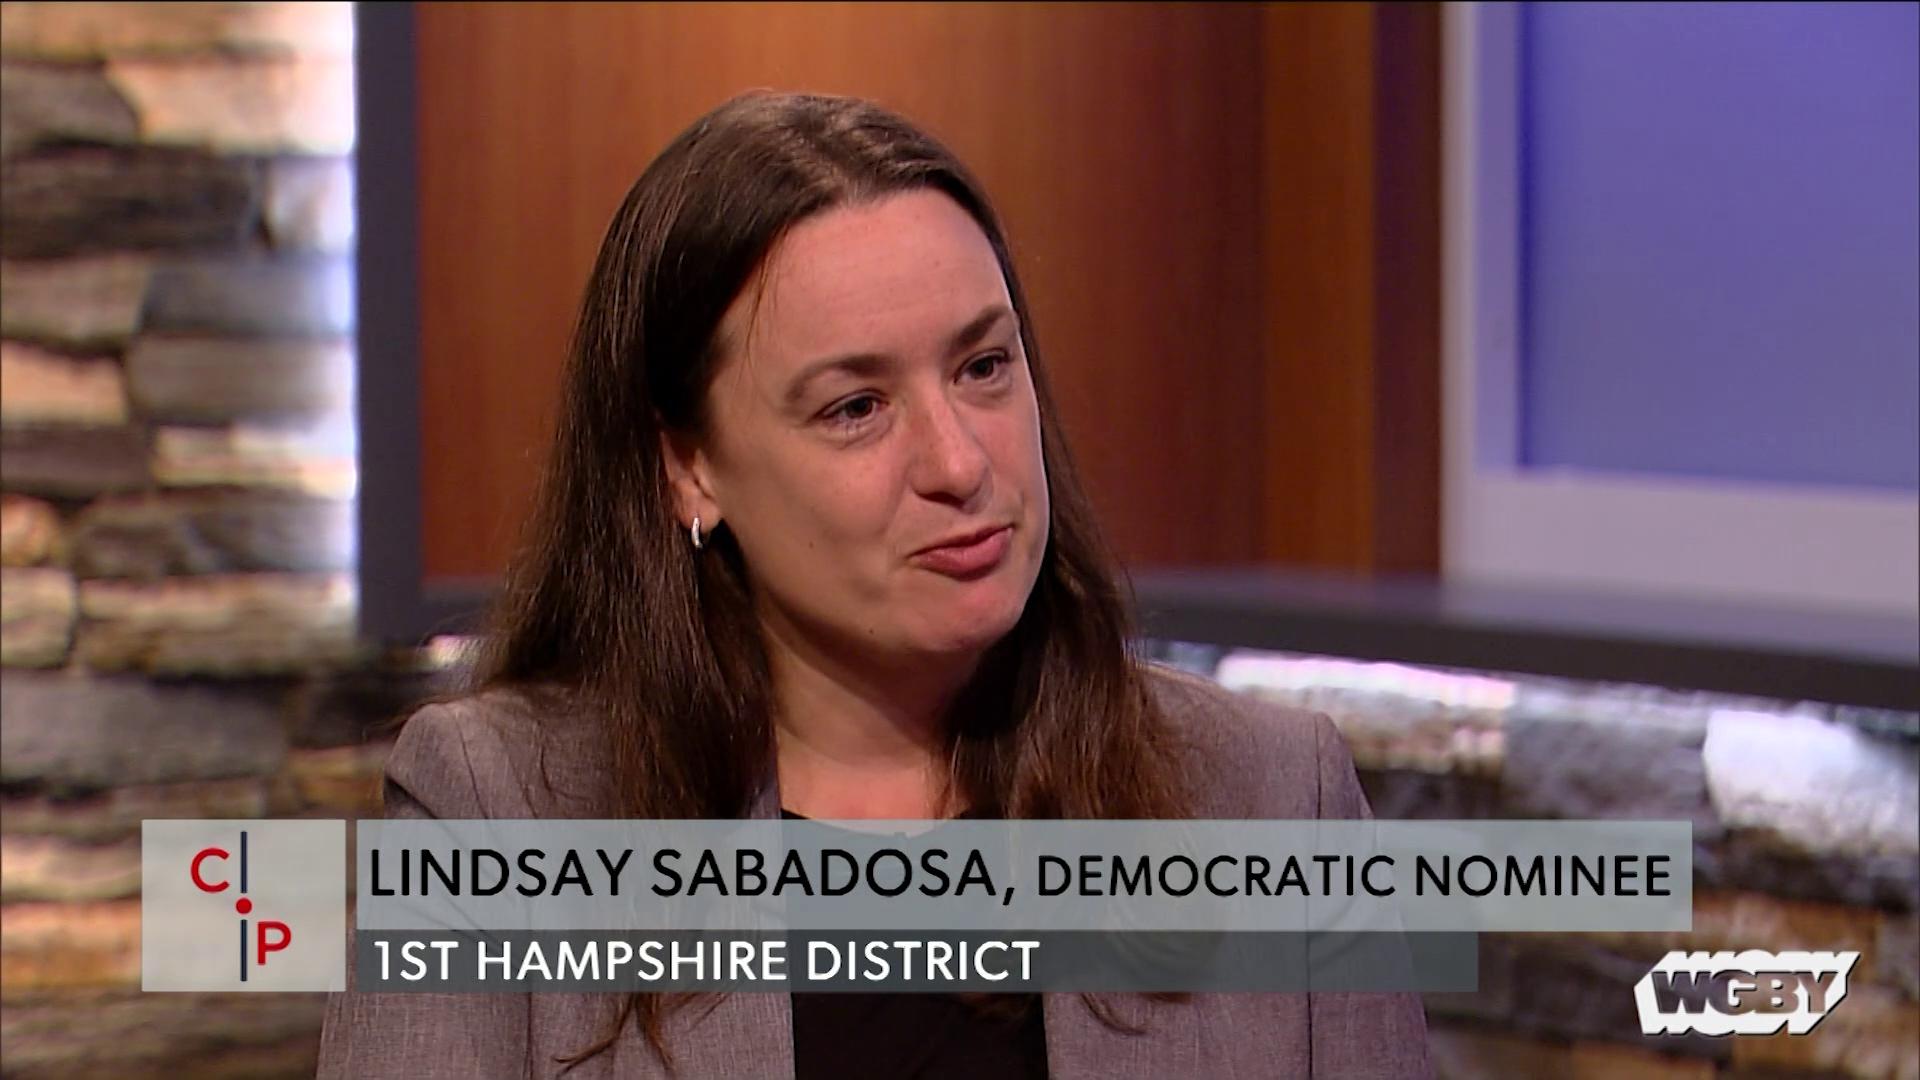 Meet the Candidates: Lindsay Sabadosa